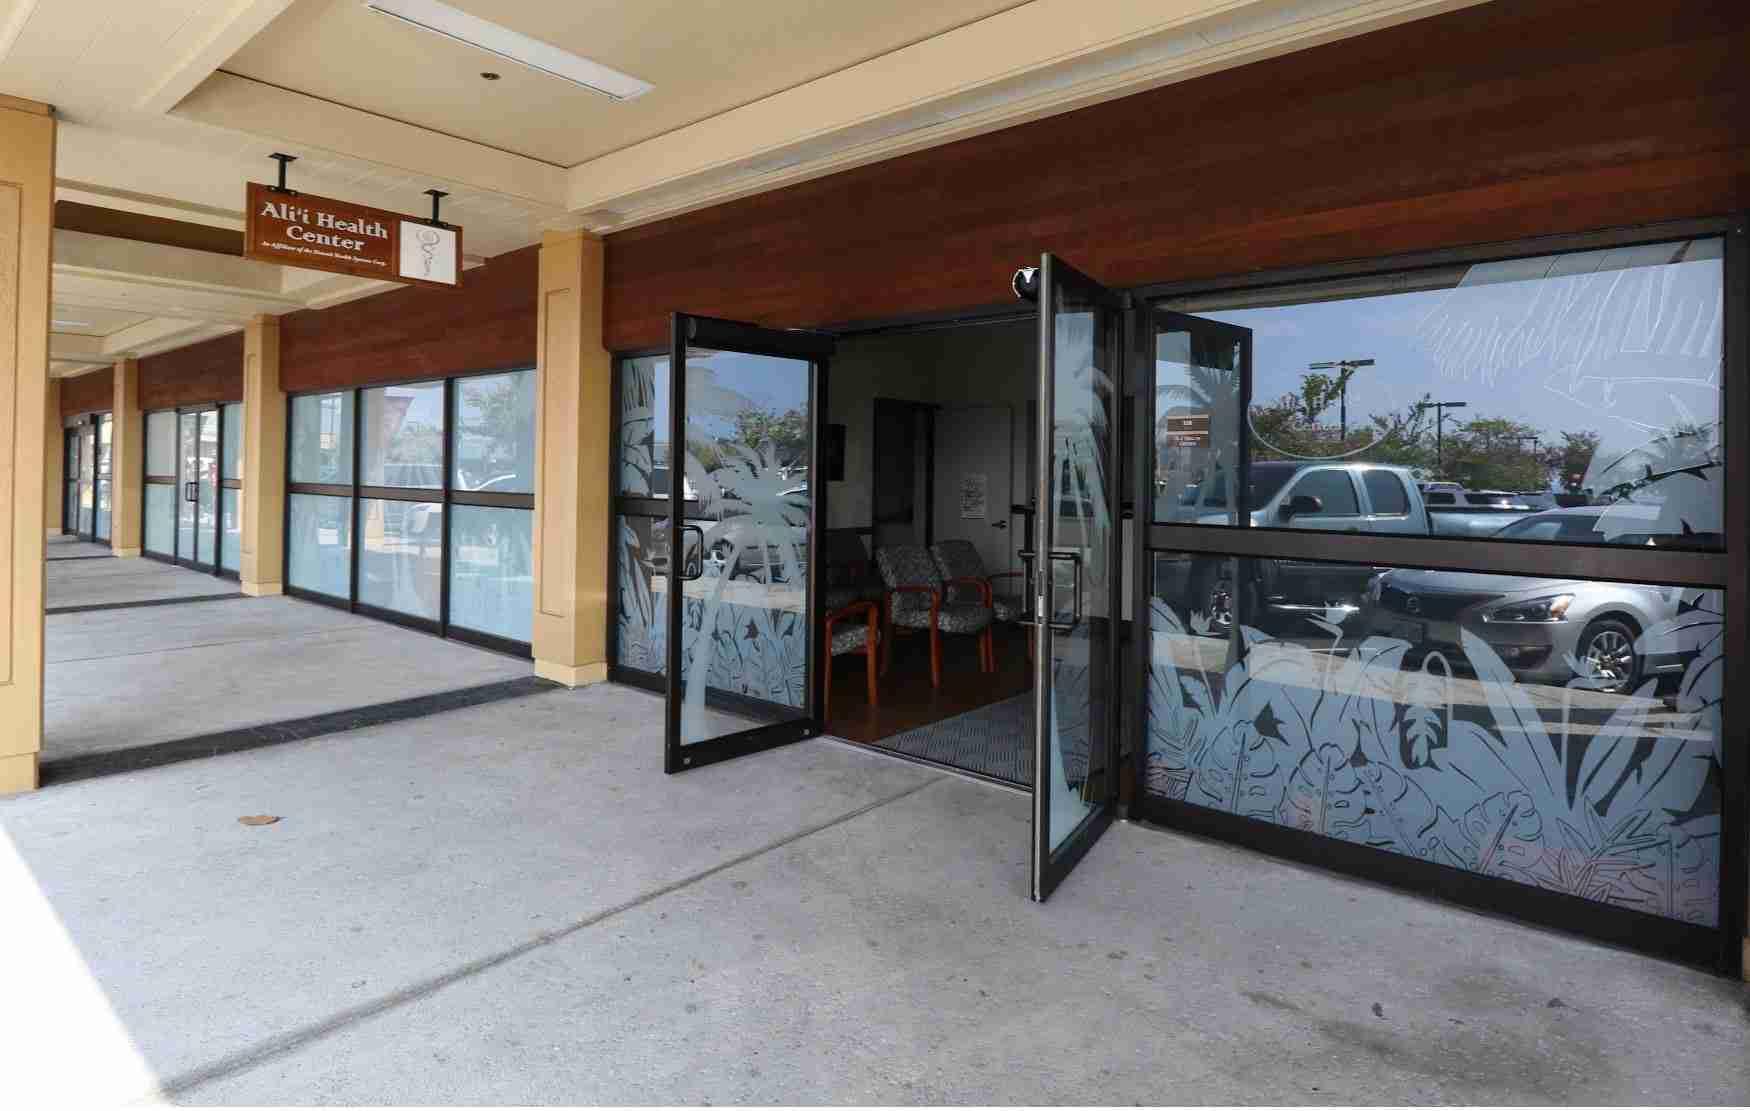 Alii Health Center Entrance